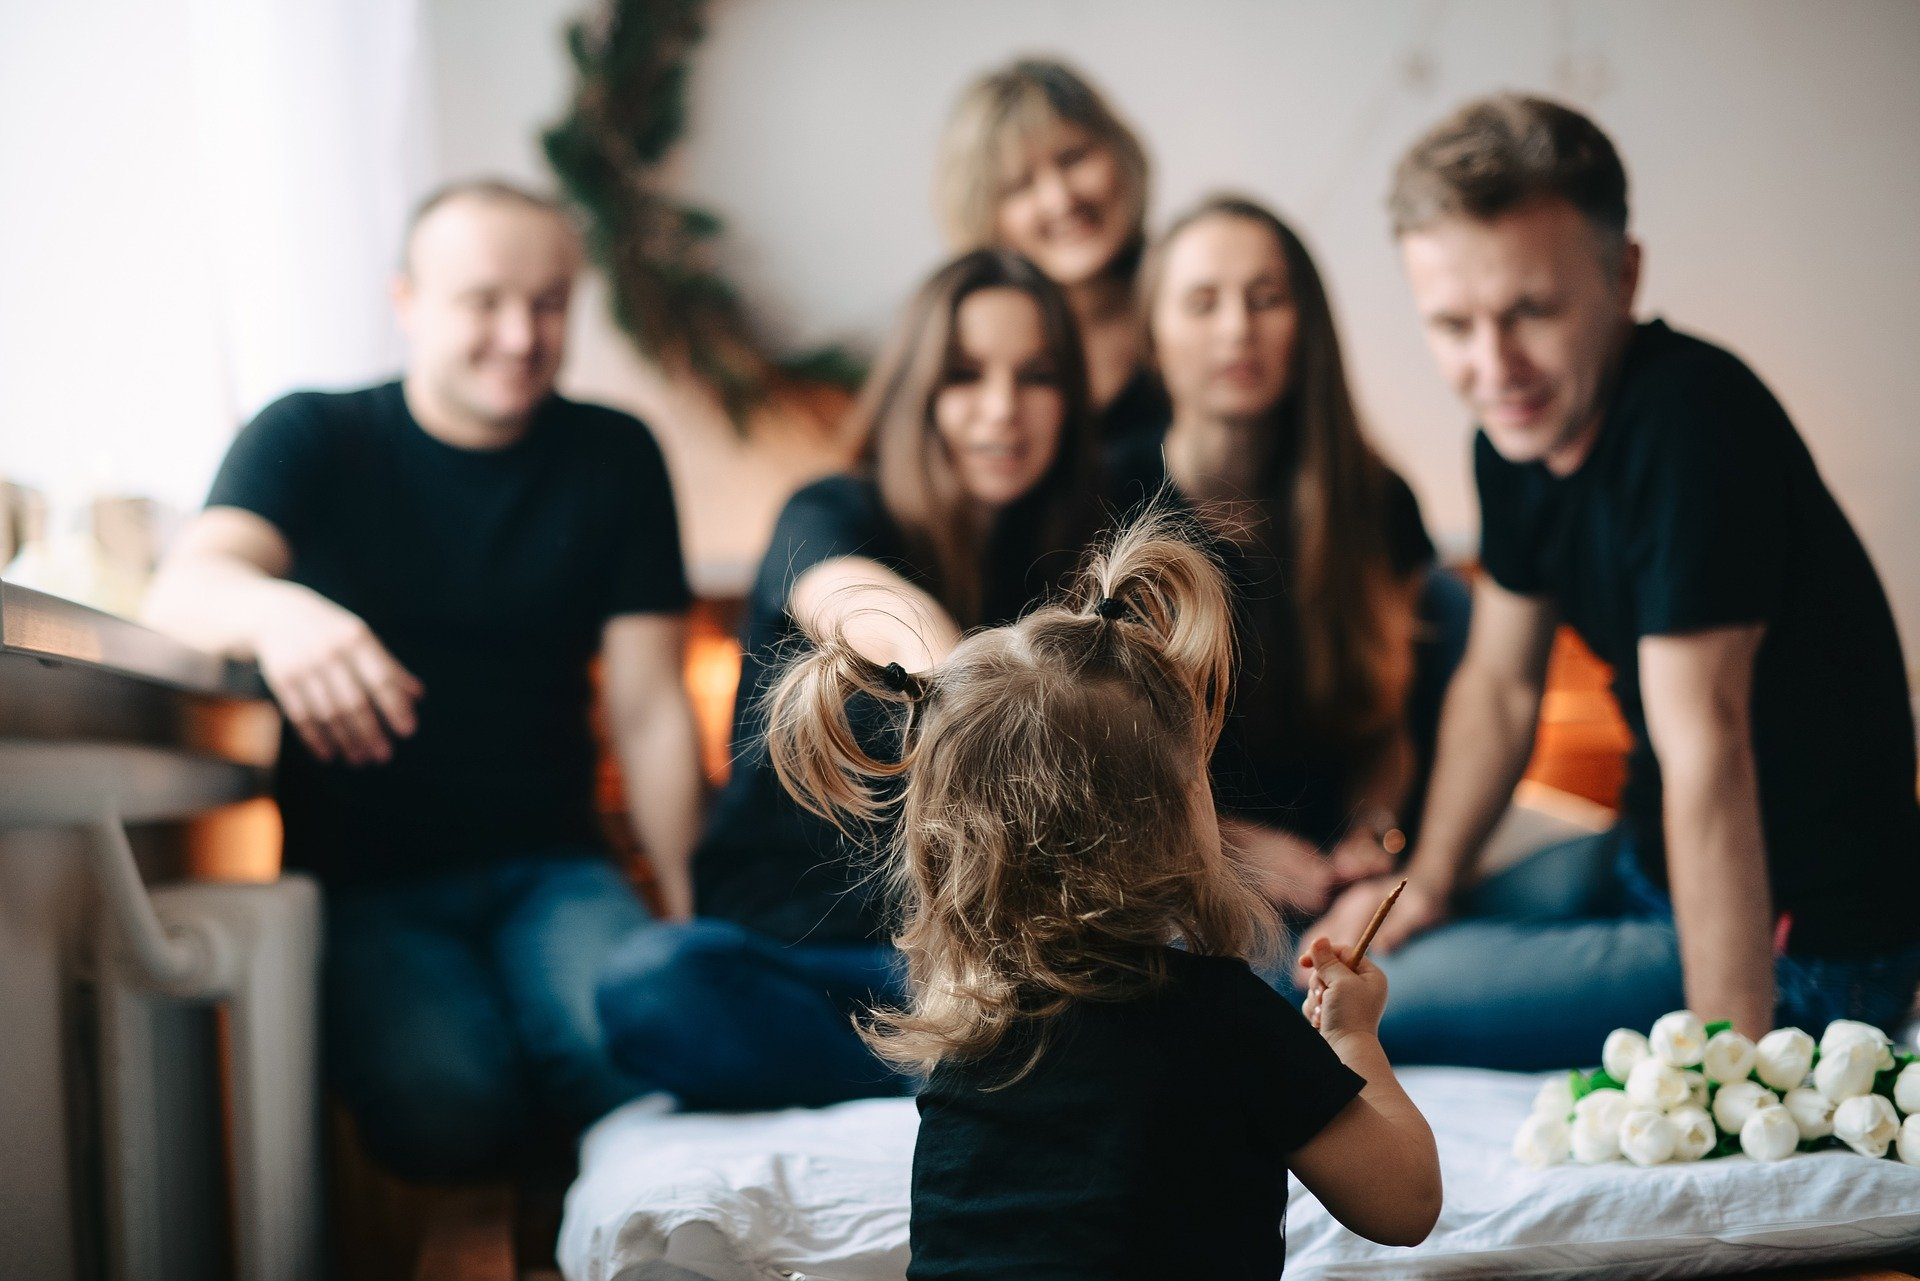 adulti e bambini che parlano e ridono insieme